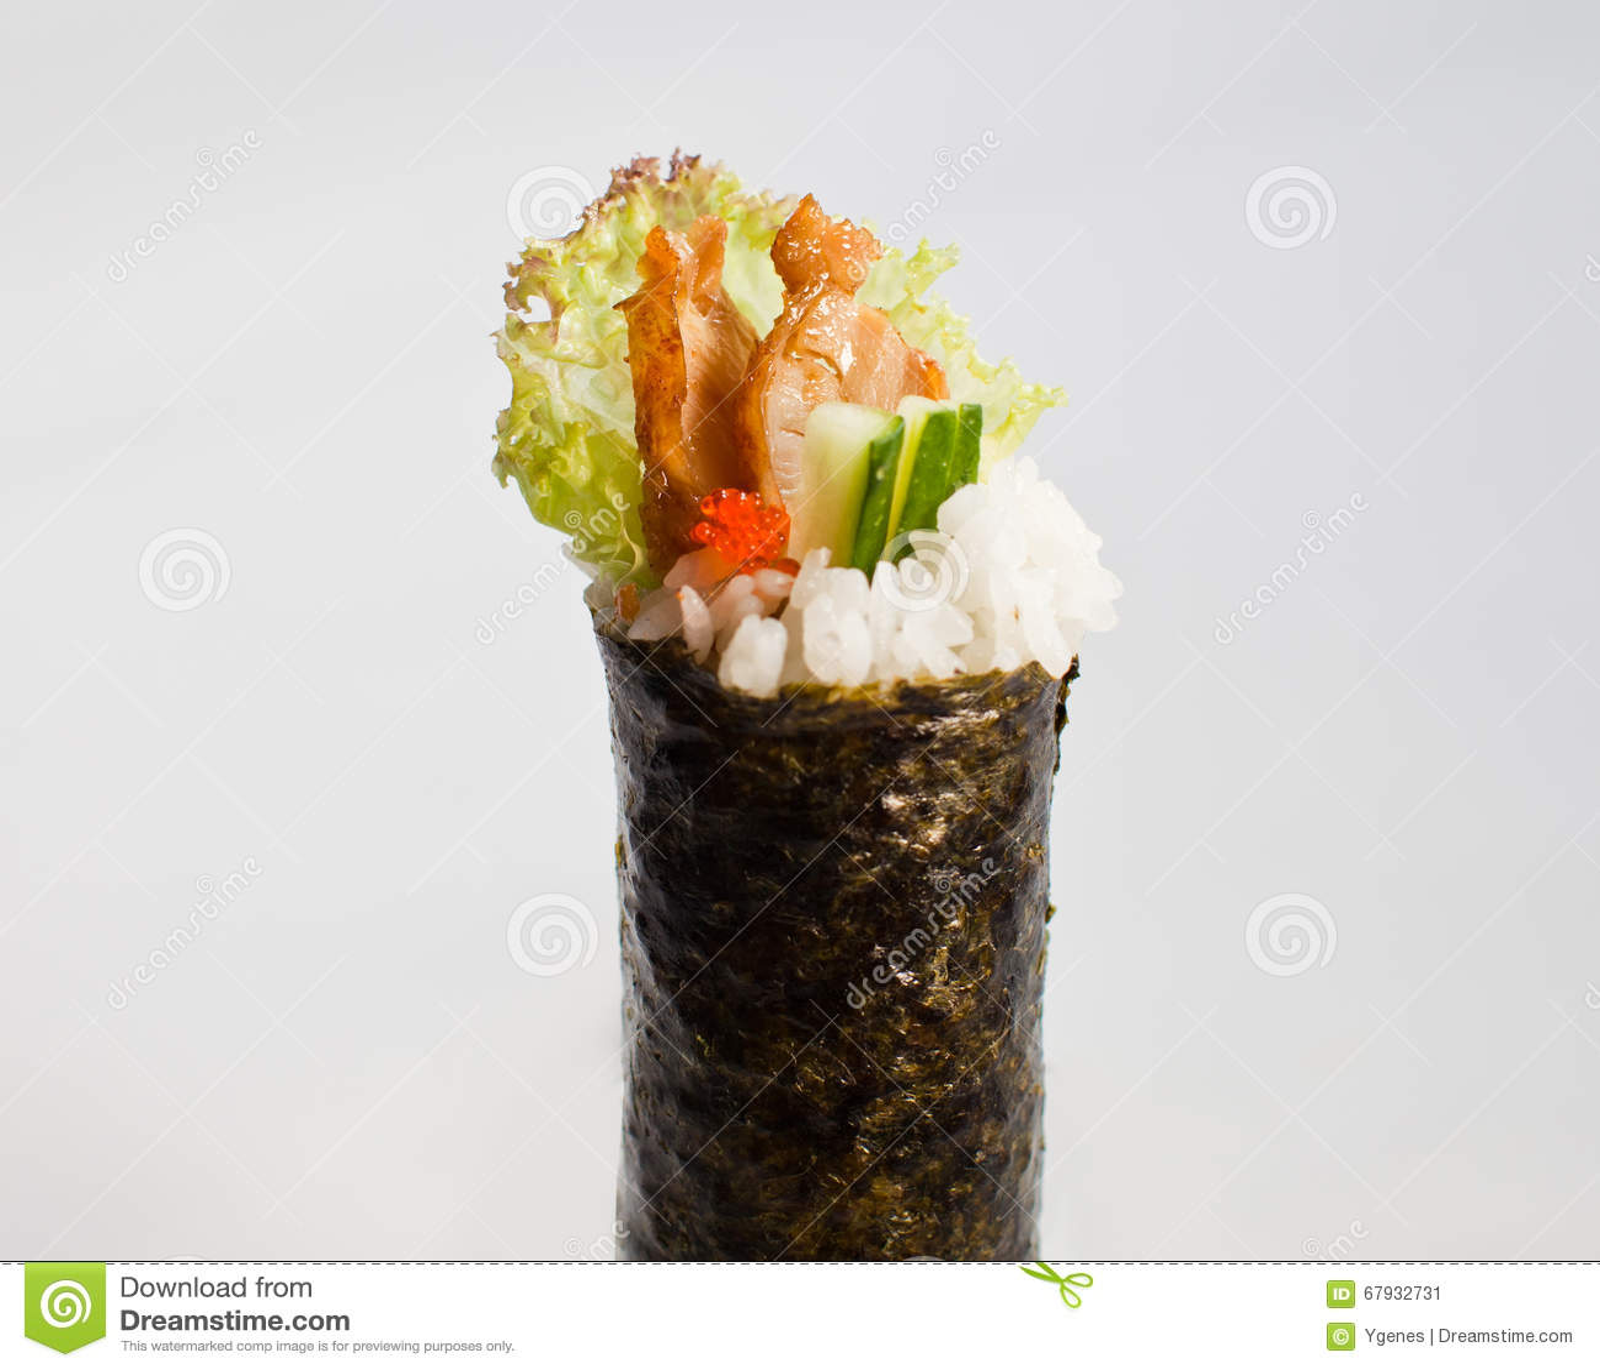 Unagi (Eel) Hand Roll Temaki Stock Image - Image: 67932731